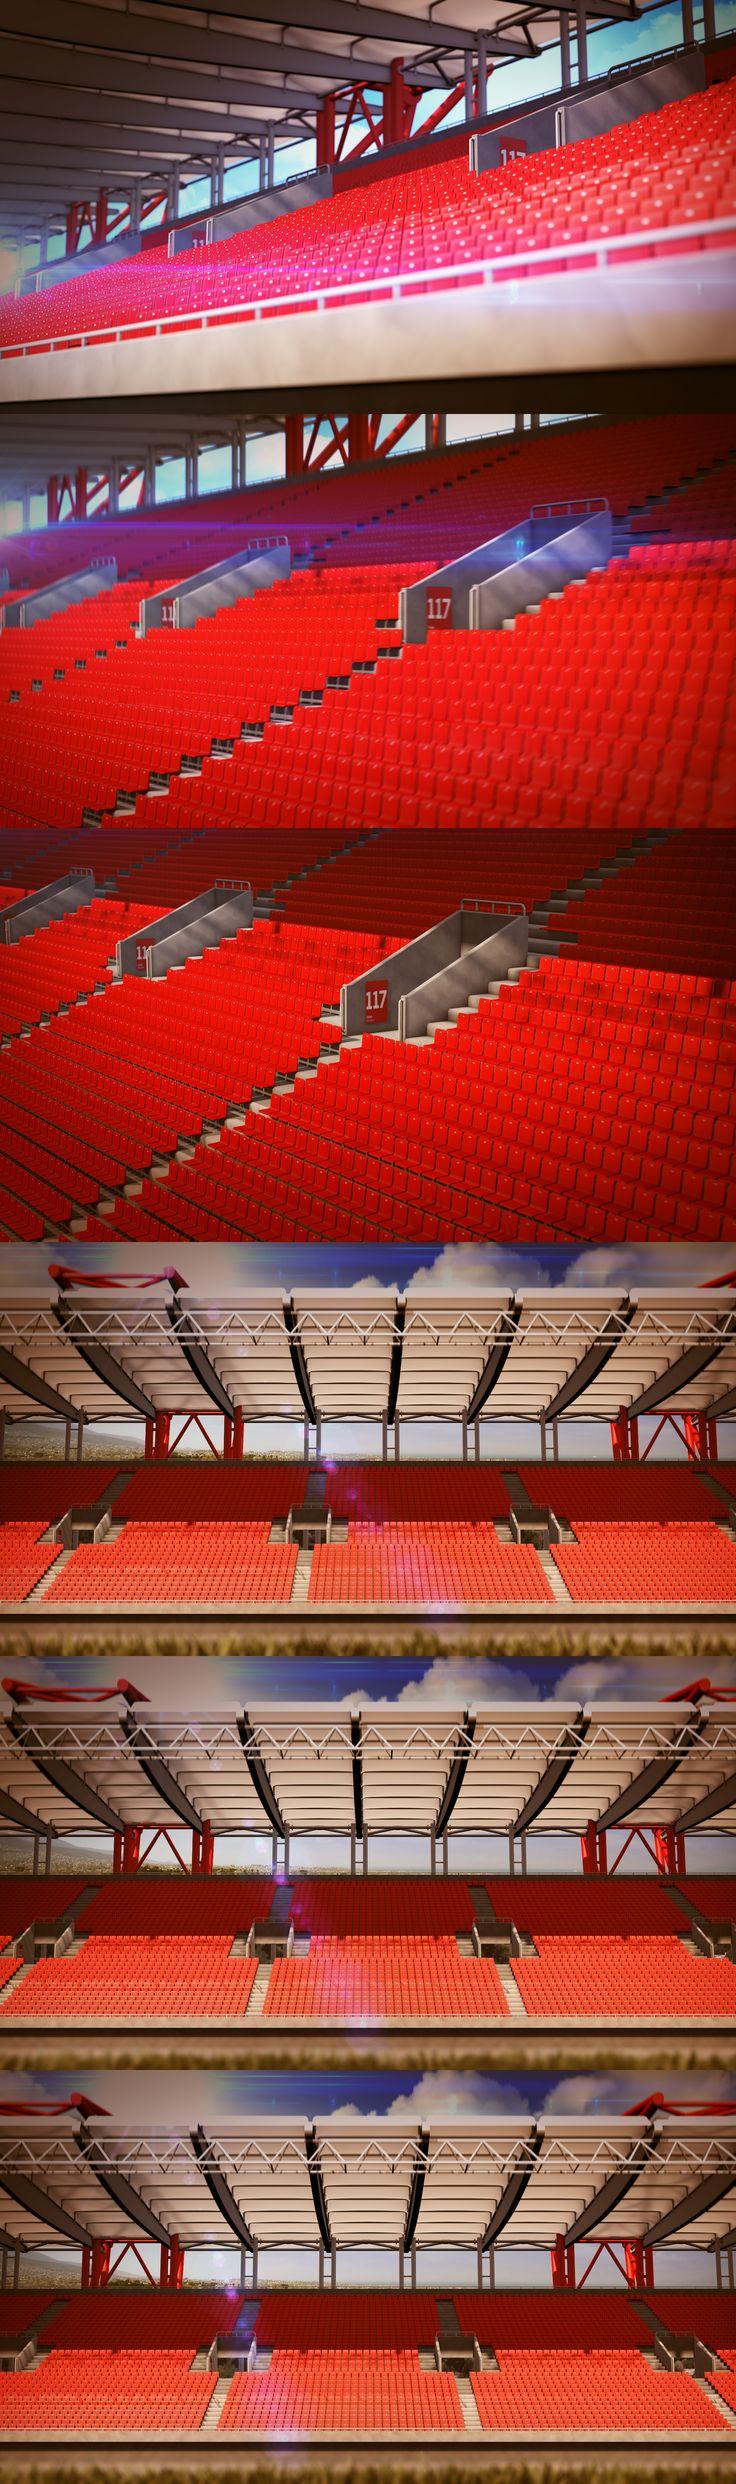 Karaiskaki Stadium Animations  (2 Shots)